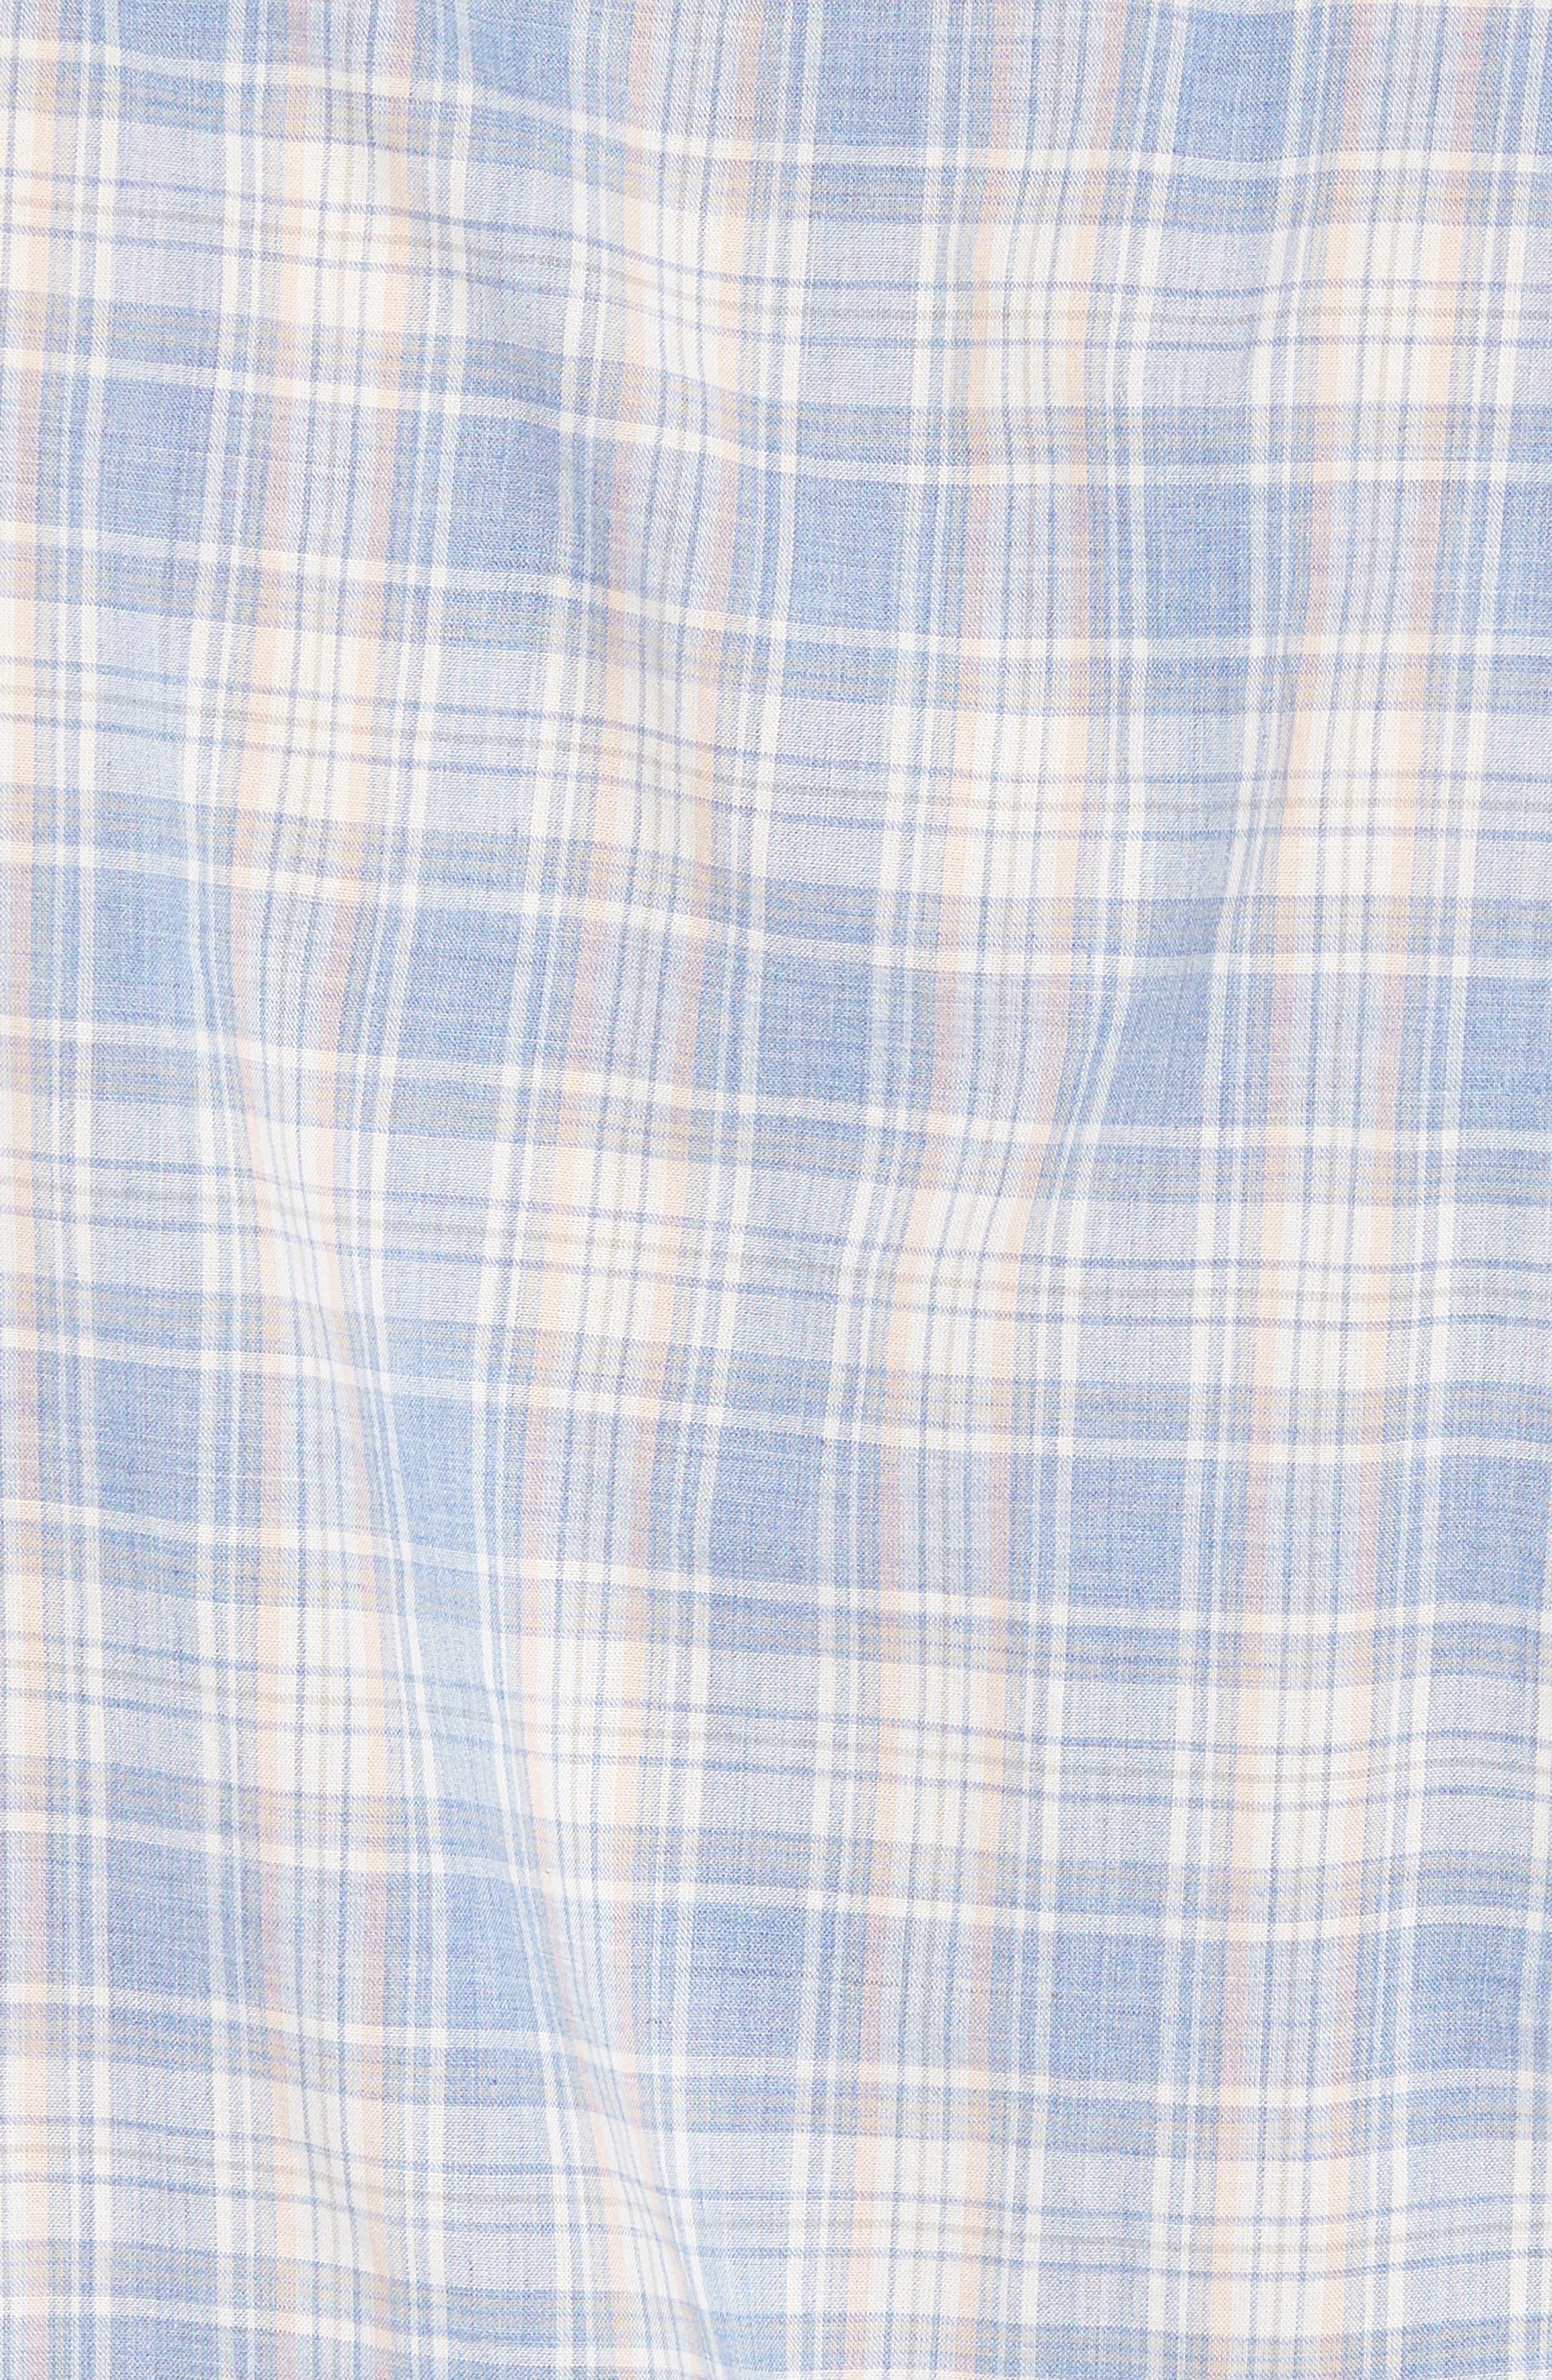 Ventura Plaid Sport Shirt,                             Alternate thumbnail 5, color,                             Blue Coral Grey